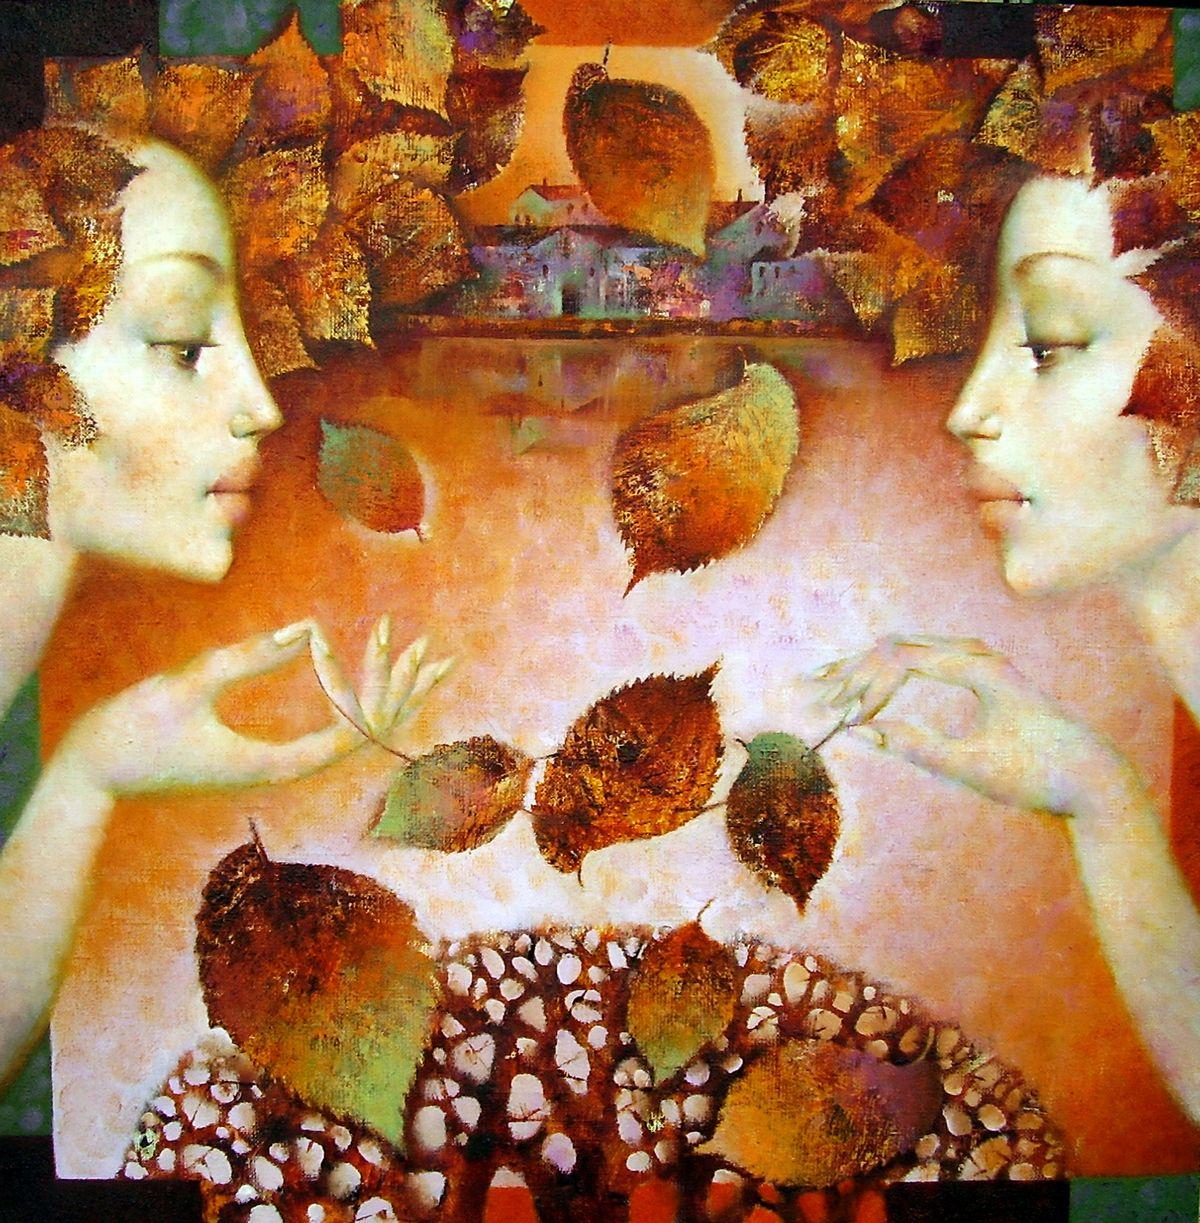 Pin van Nadir Novell op Twins | Seizoenen, Herfst, Impressionisme